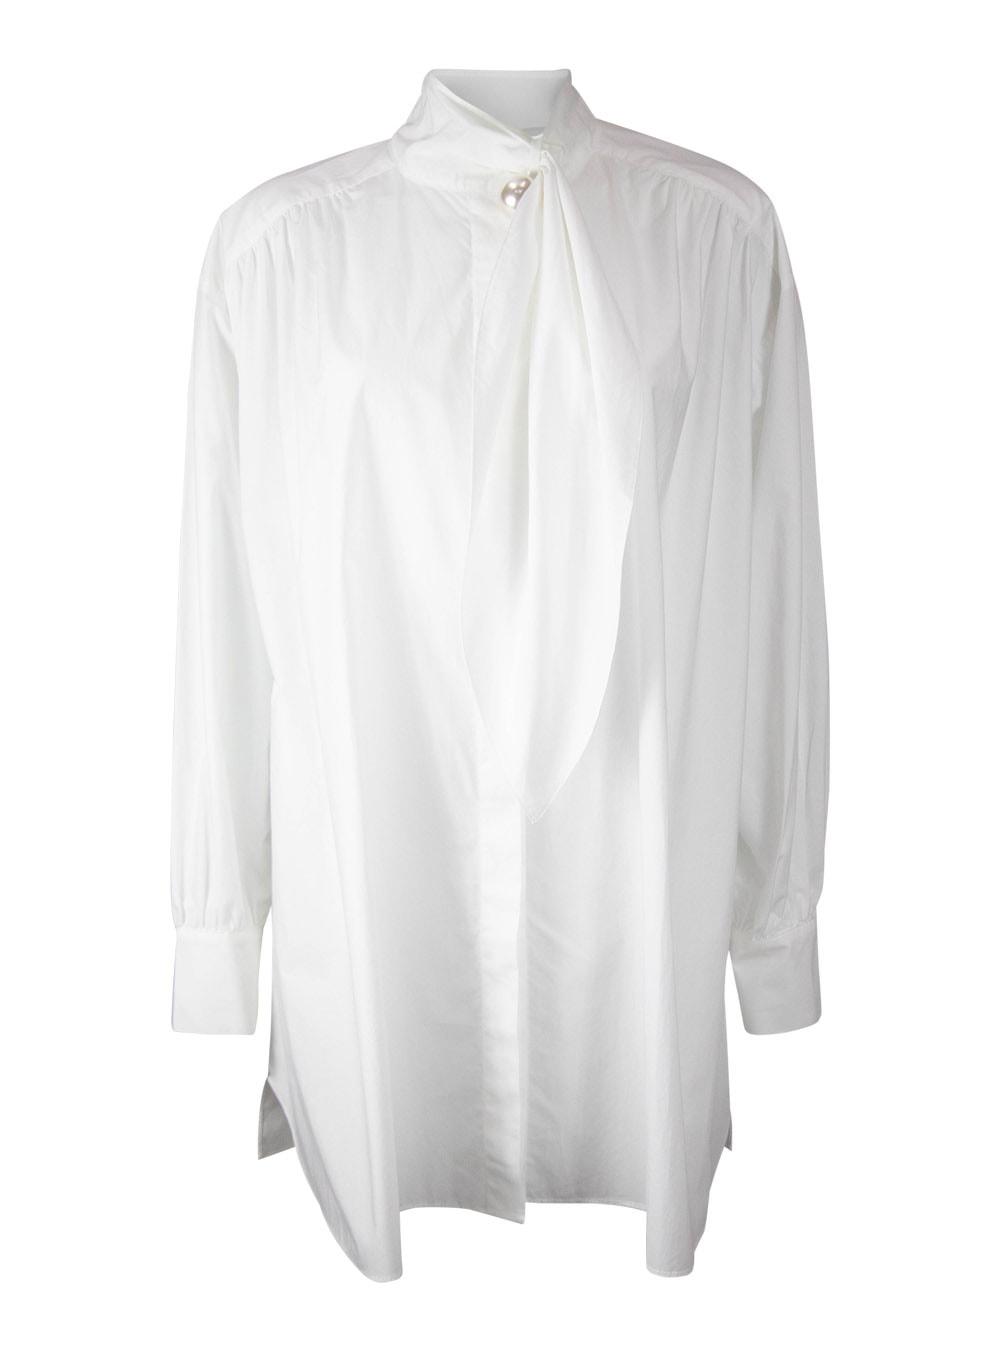 Pearl Button High Collar Shirt Societya